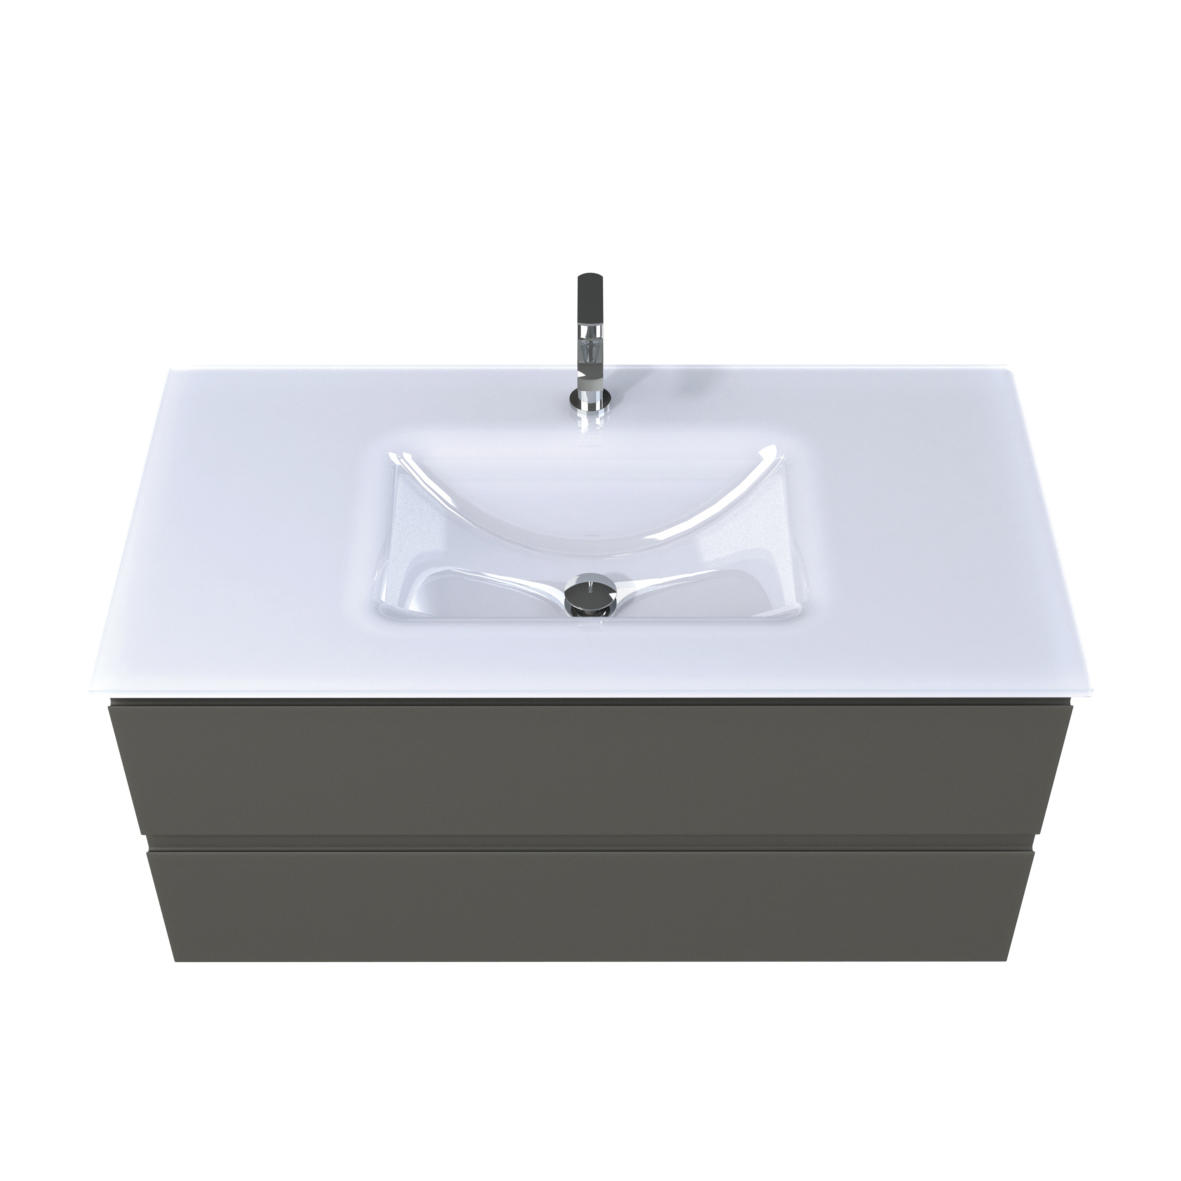 Verre blanc alpin | Meubles de salle de bains, baignoires, fabricant ...